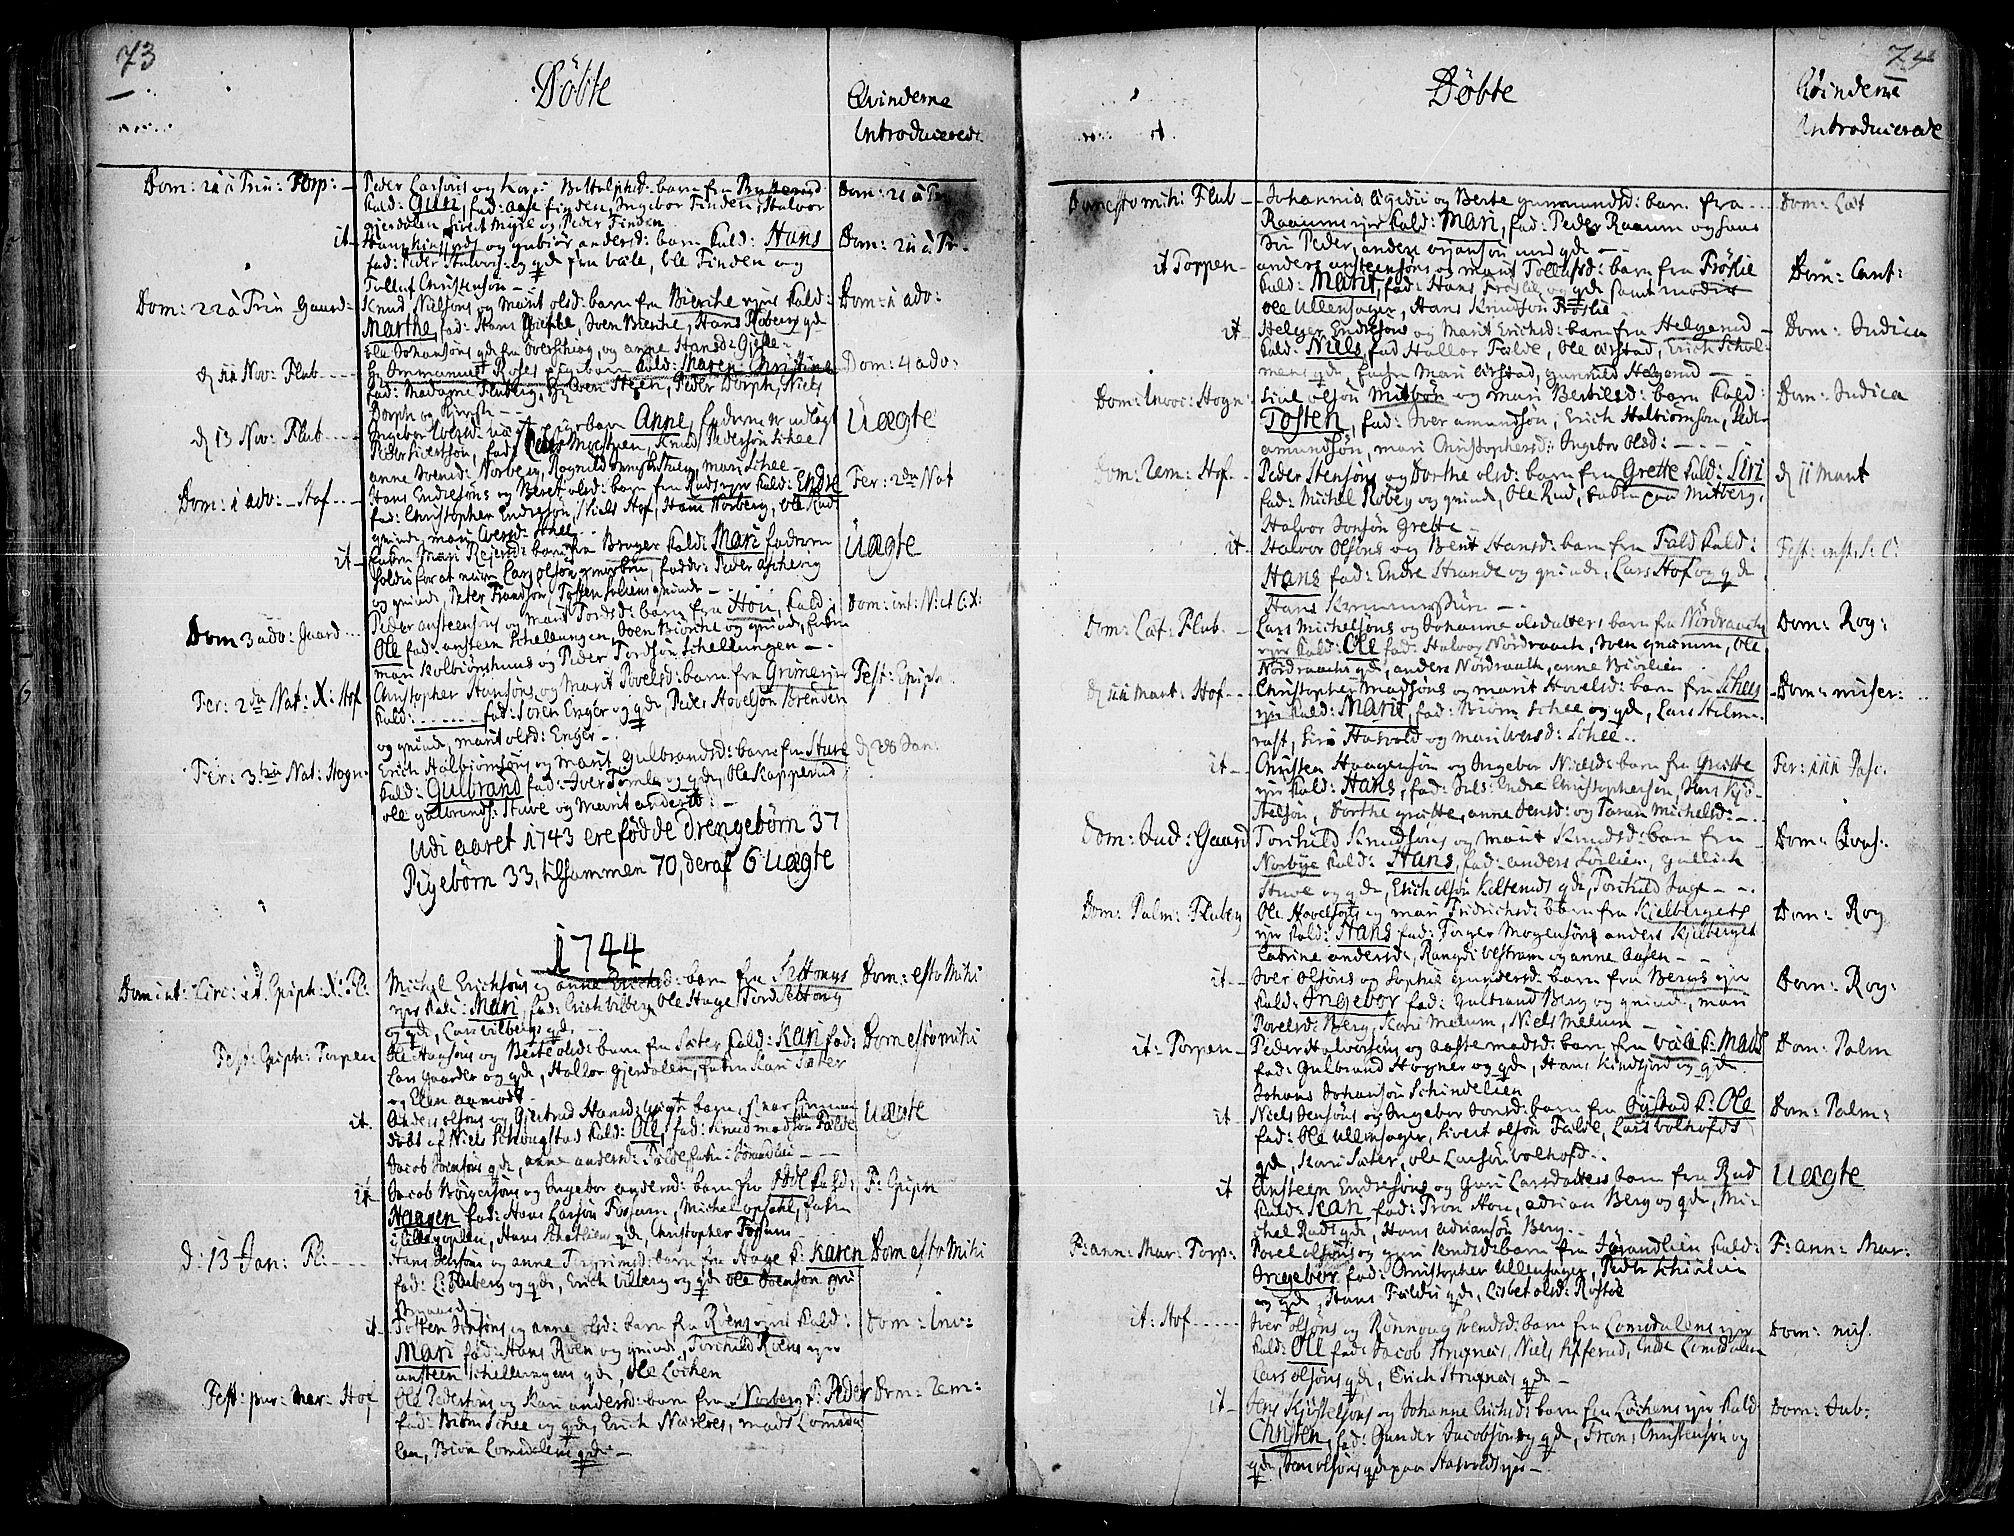 SAH, Land prestekontor, Ministerialbok nr. 2, 1733-1764, s. 73-74